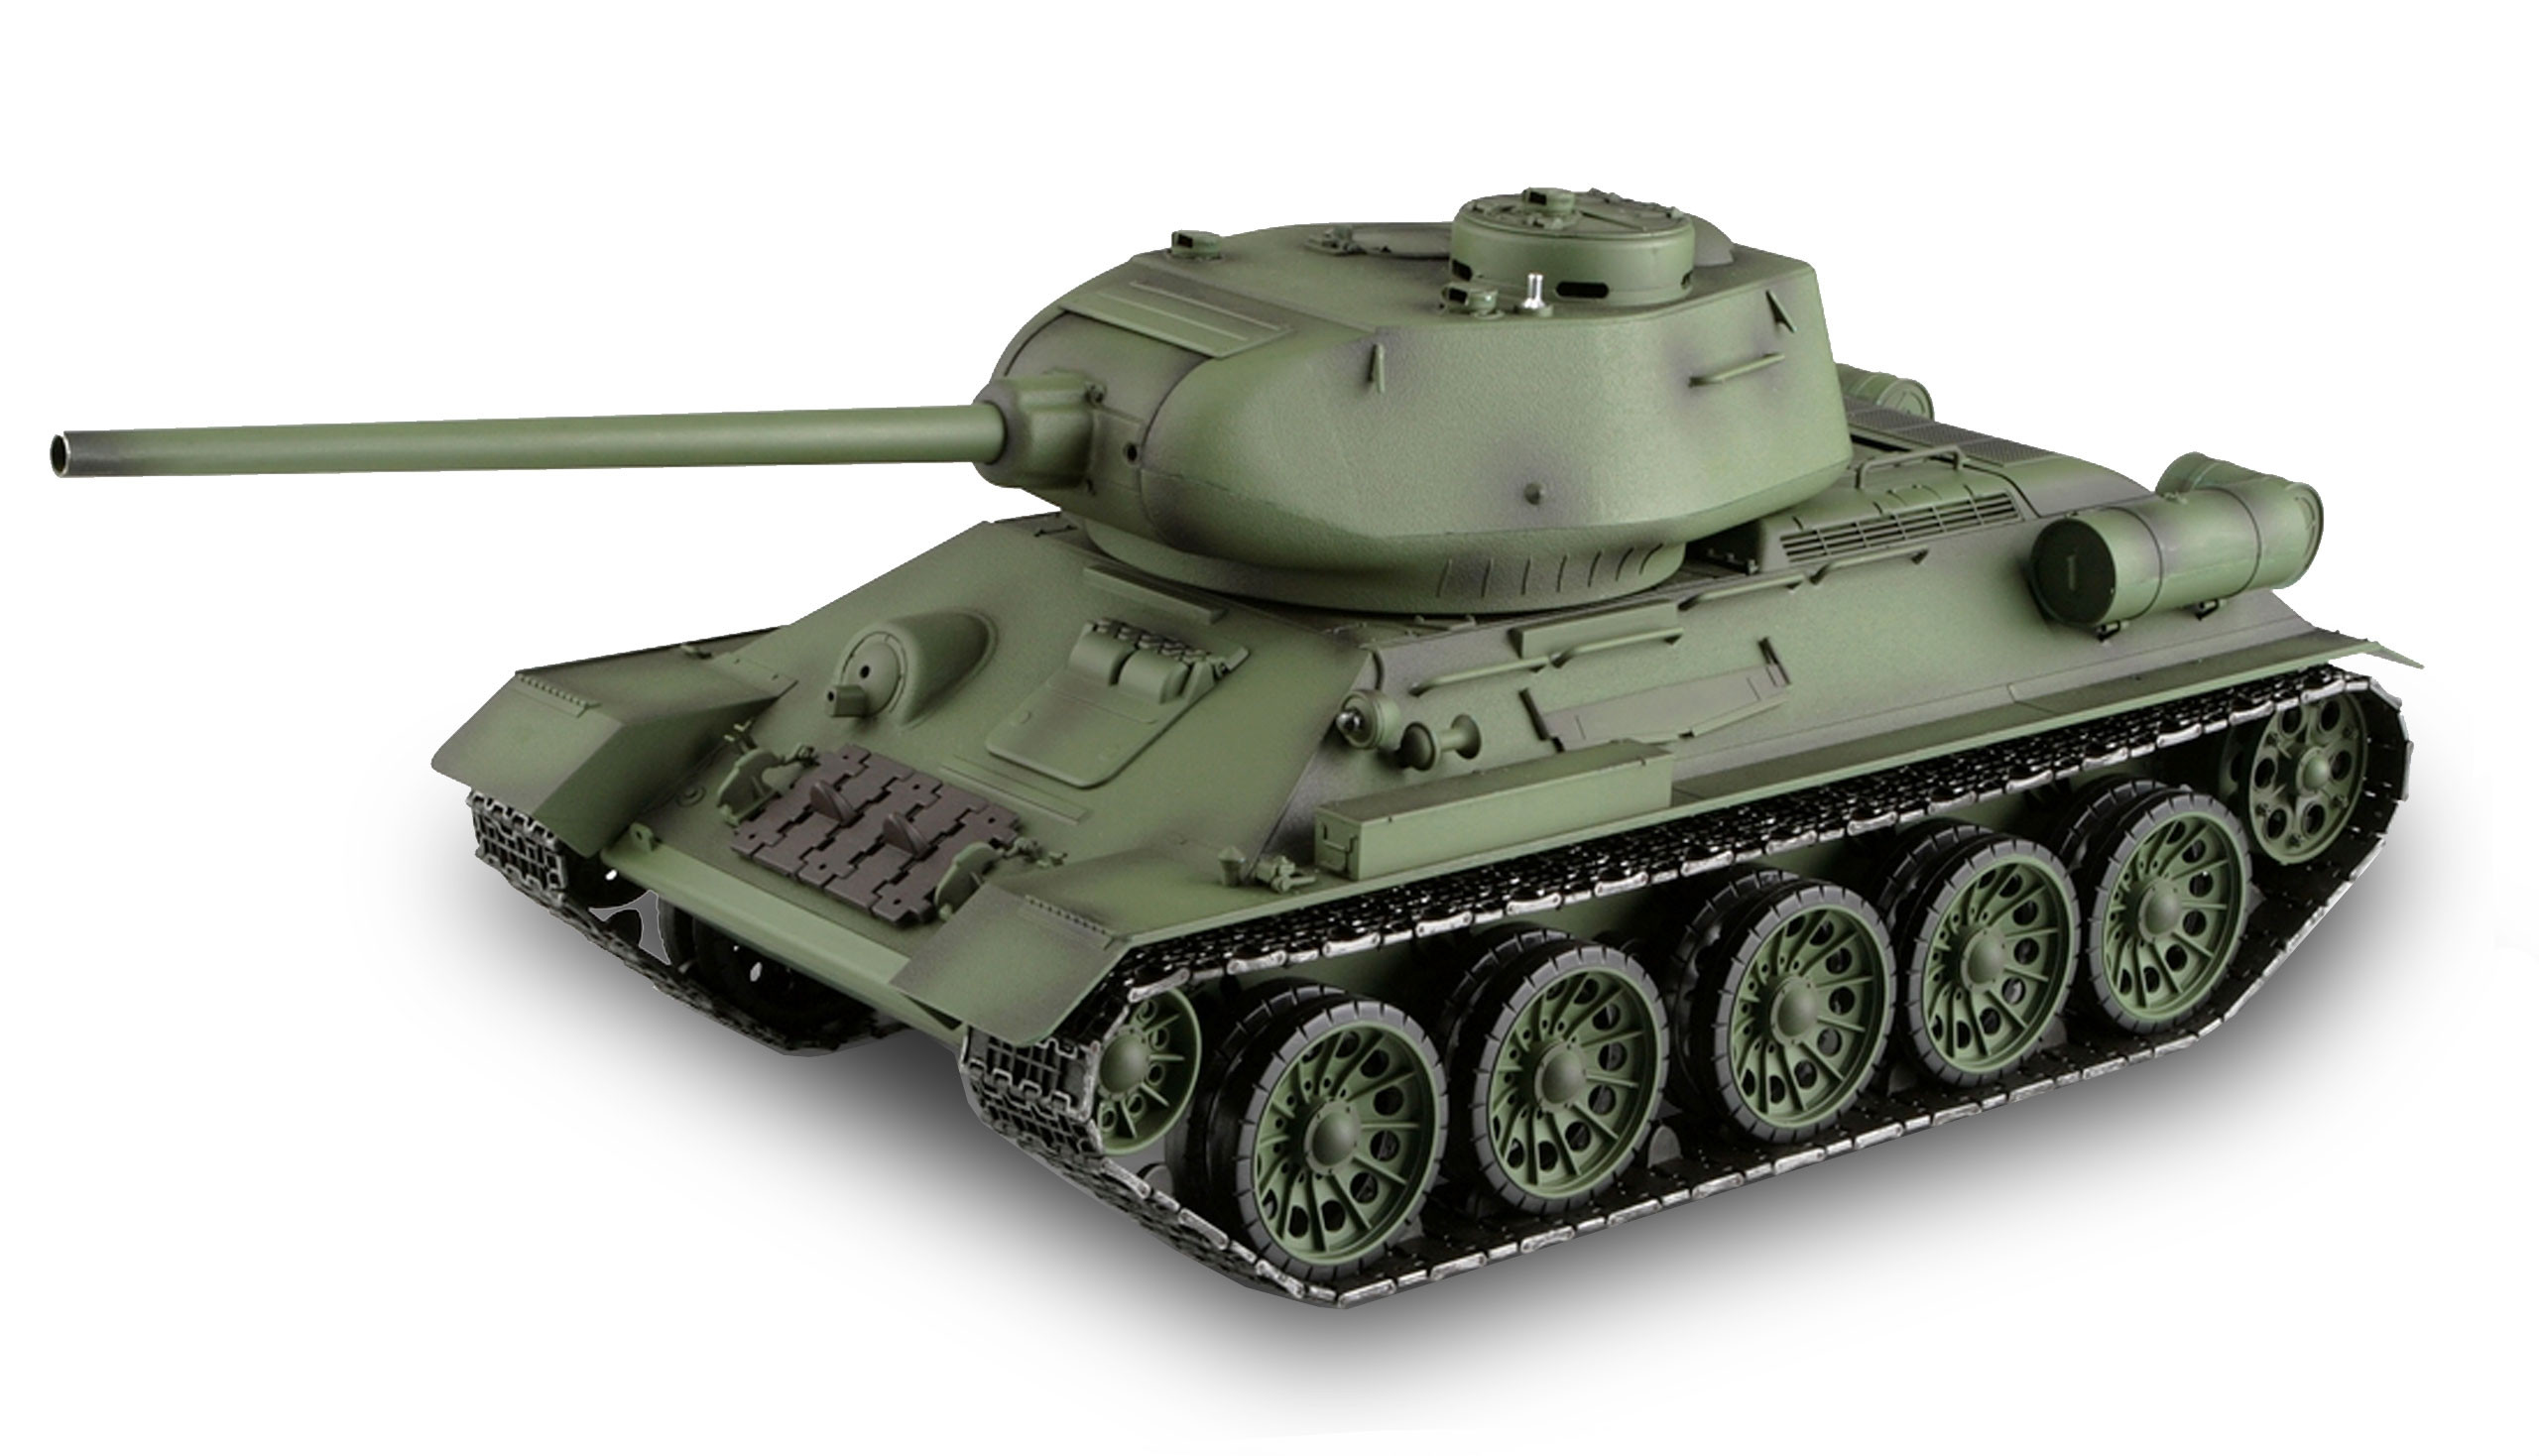 Amewi 23075 - Funkgesteuerter (RC) Panzer - Elektromotor - 1:16 - Betriebsbereit (RTR) - Camouflage